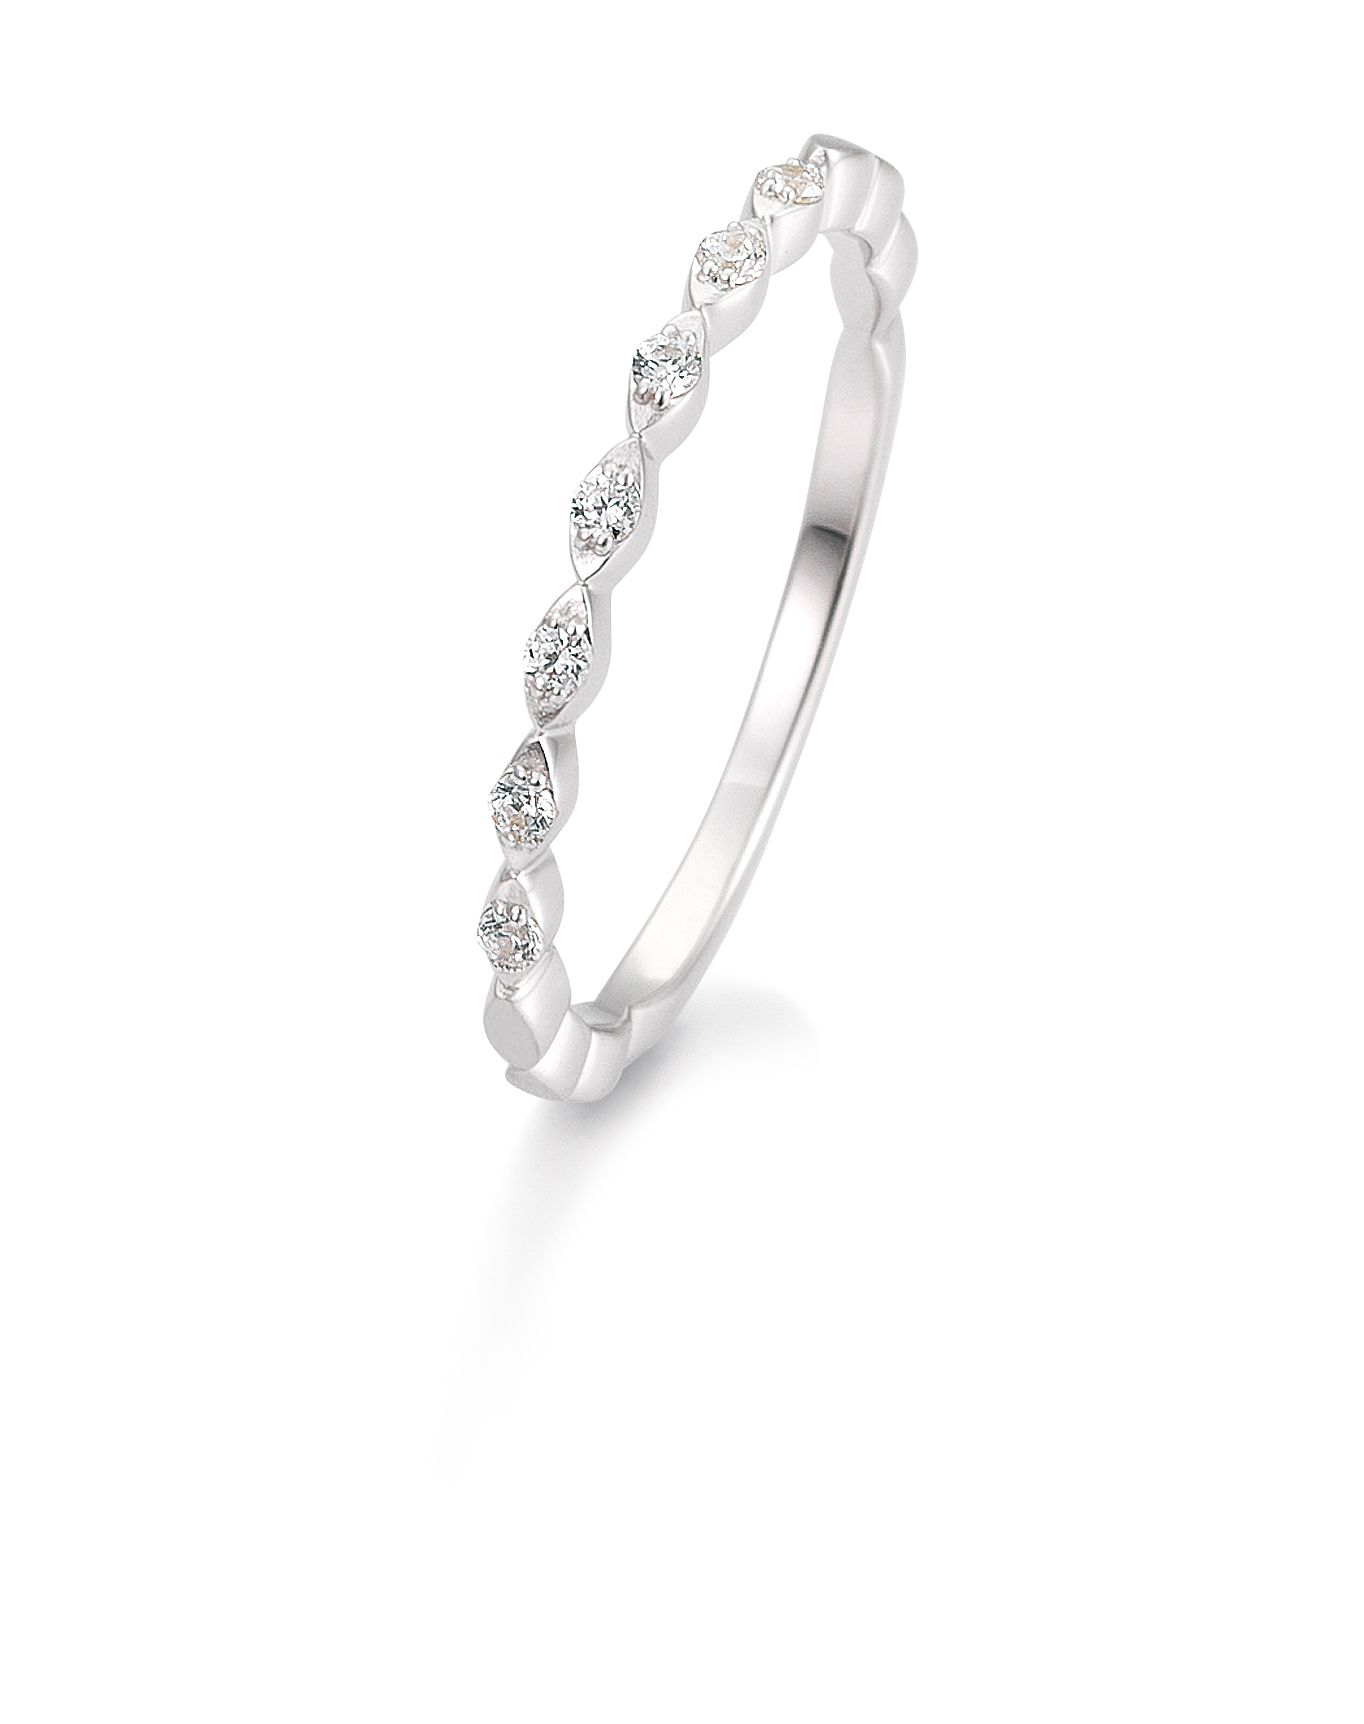 Vintage Diamantring 4105708 Goldschmuck Ring   Retro